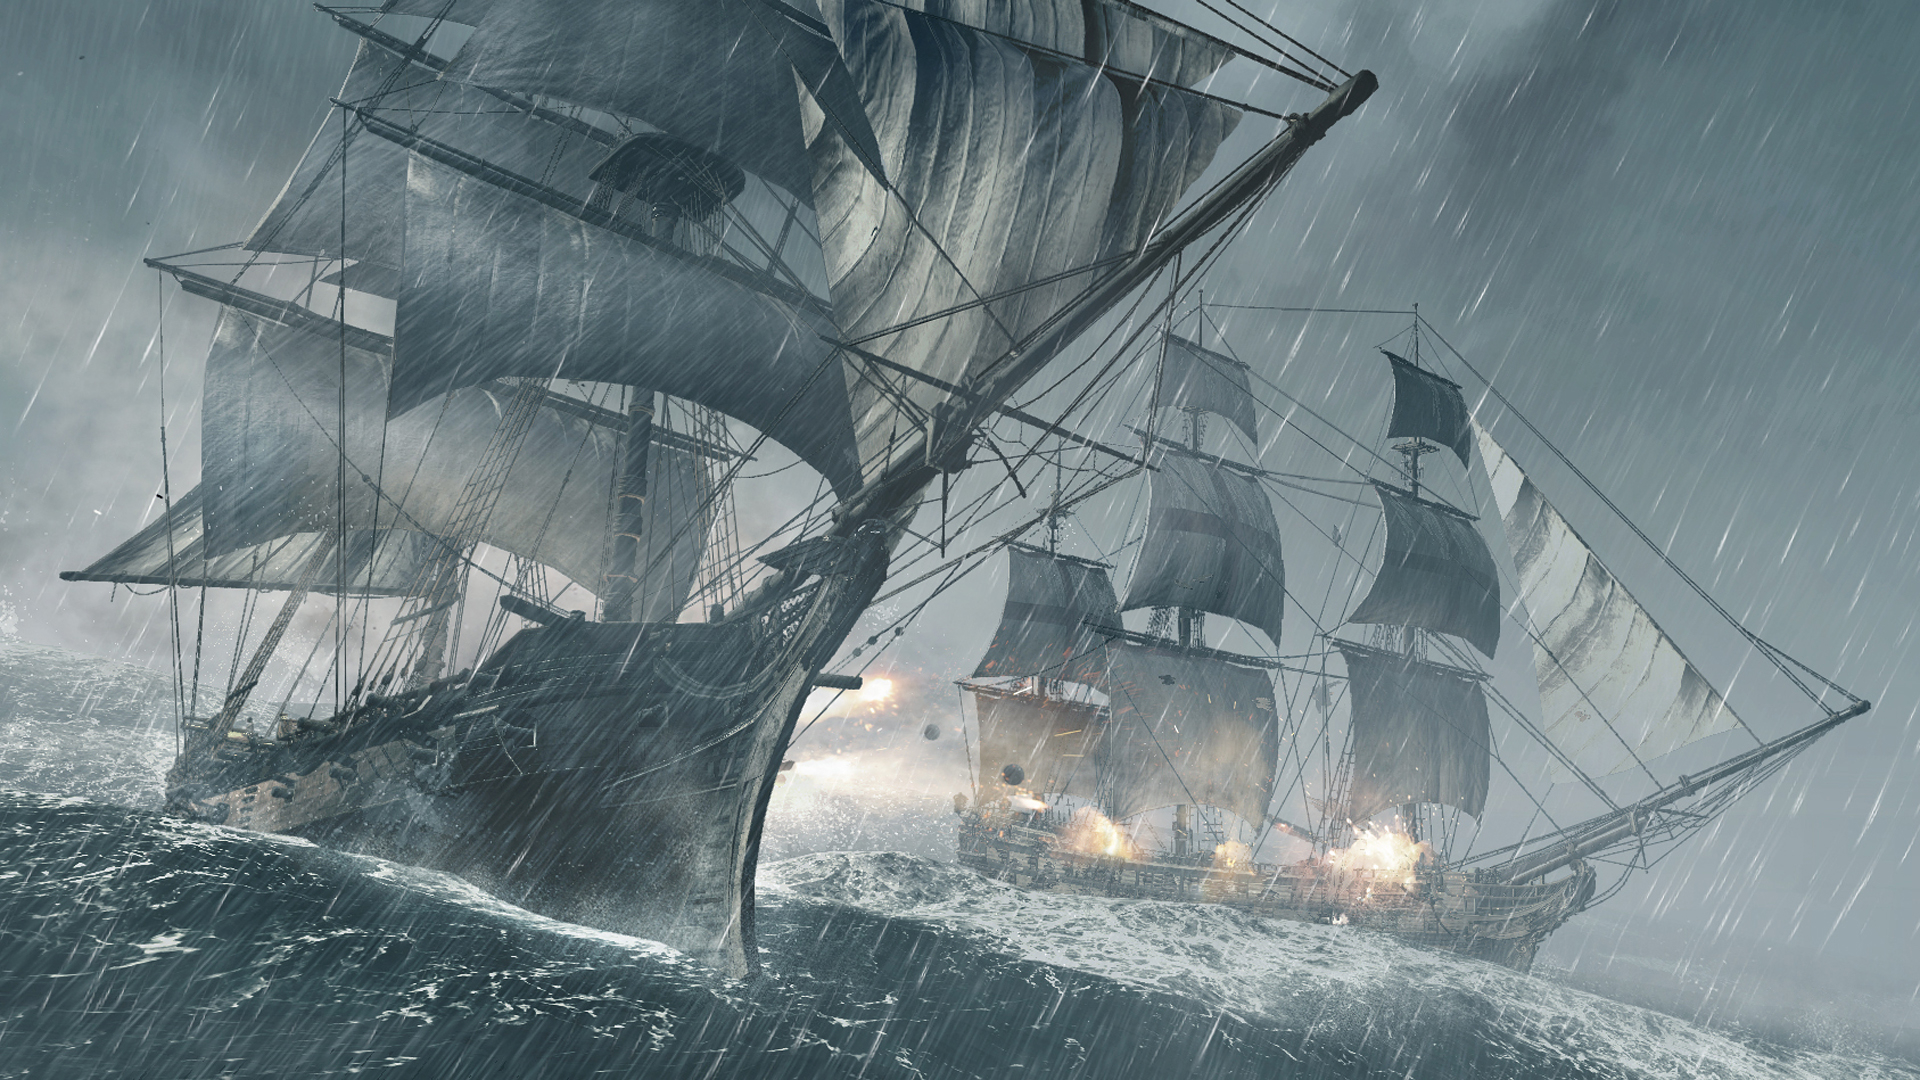 Assassin's Creed 4: Black Flag walkthrough shows off more naval